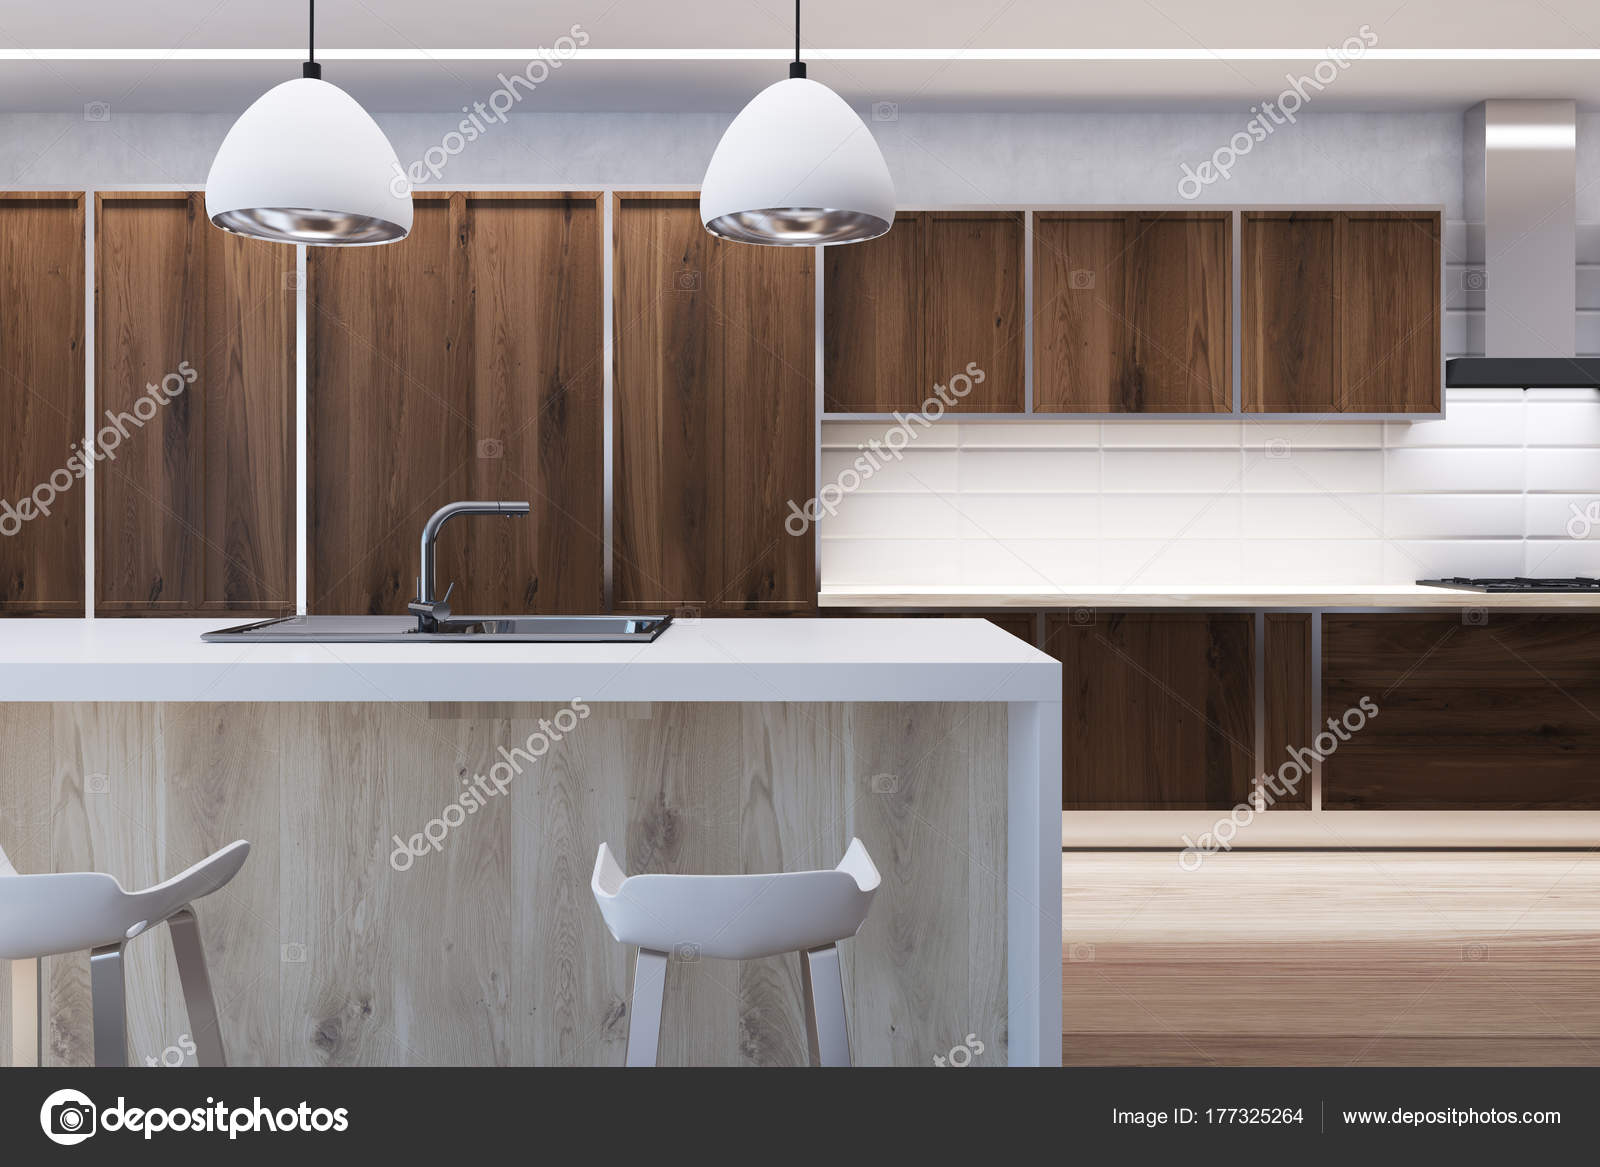 kitchen bar lights retro table and chairs 黑木厨房与酒吧关闭 图库照片 c denisismagilov 177325264